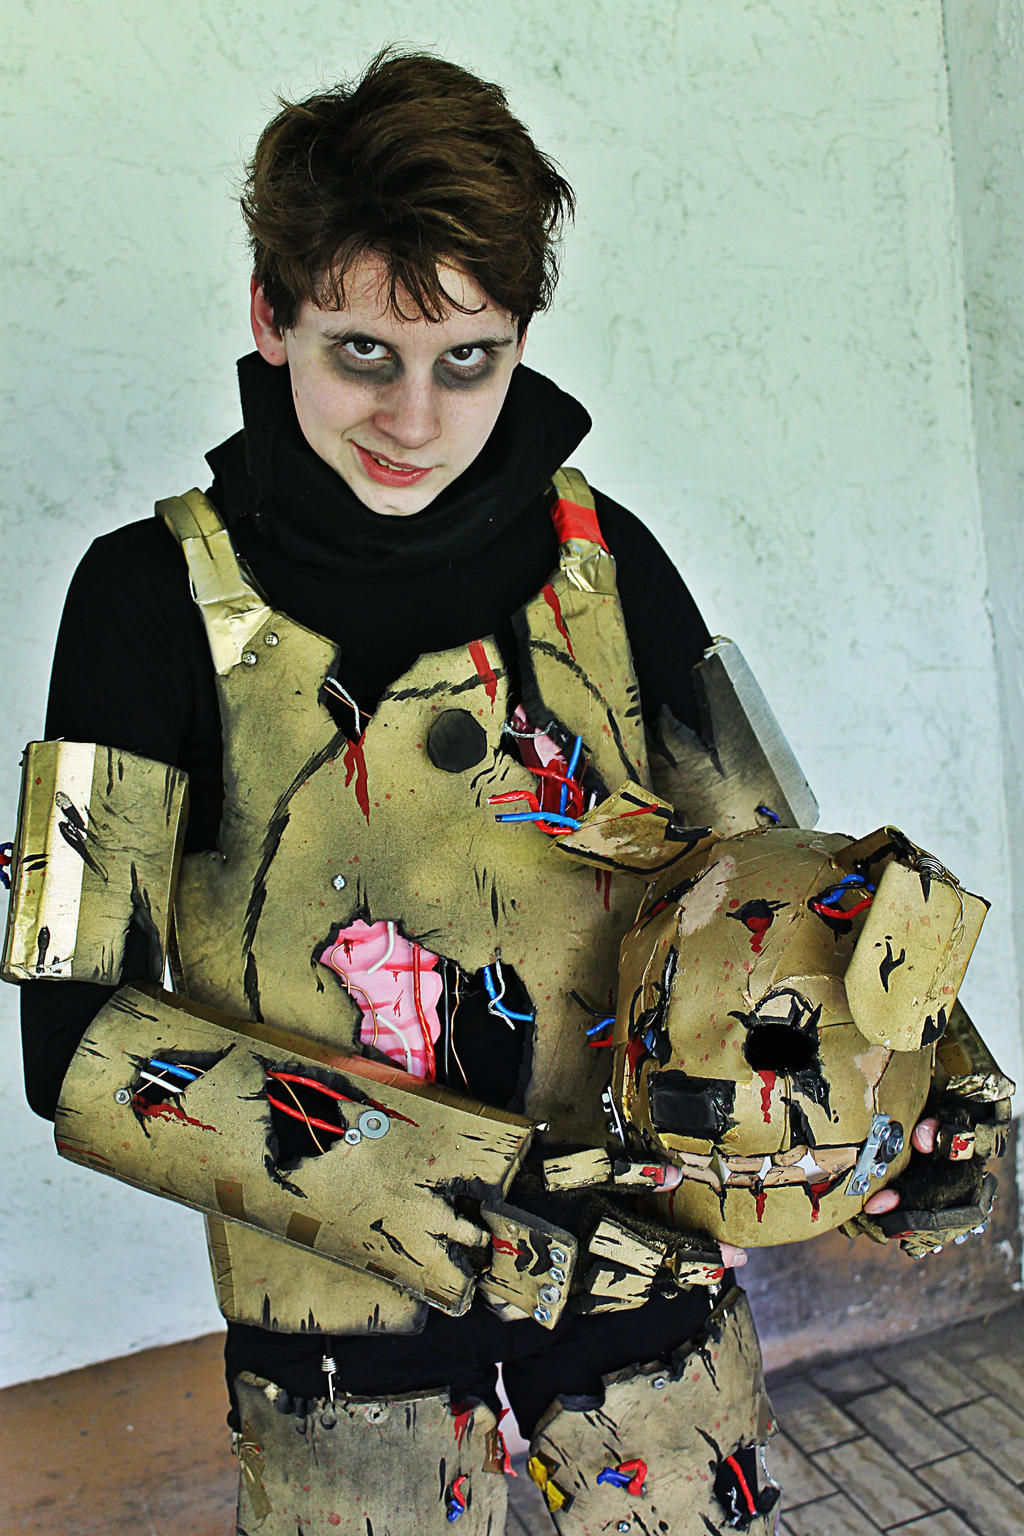 Fnaf 3 springtrap cosplay by fandomartistalley on deviantart